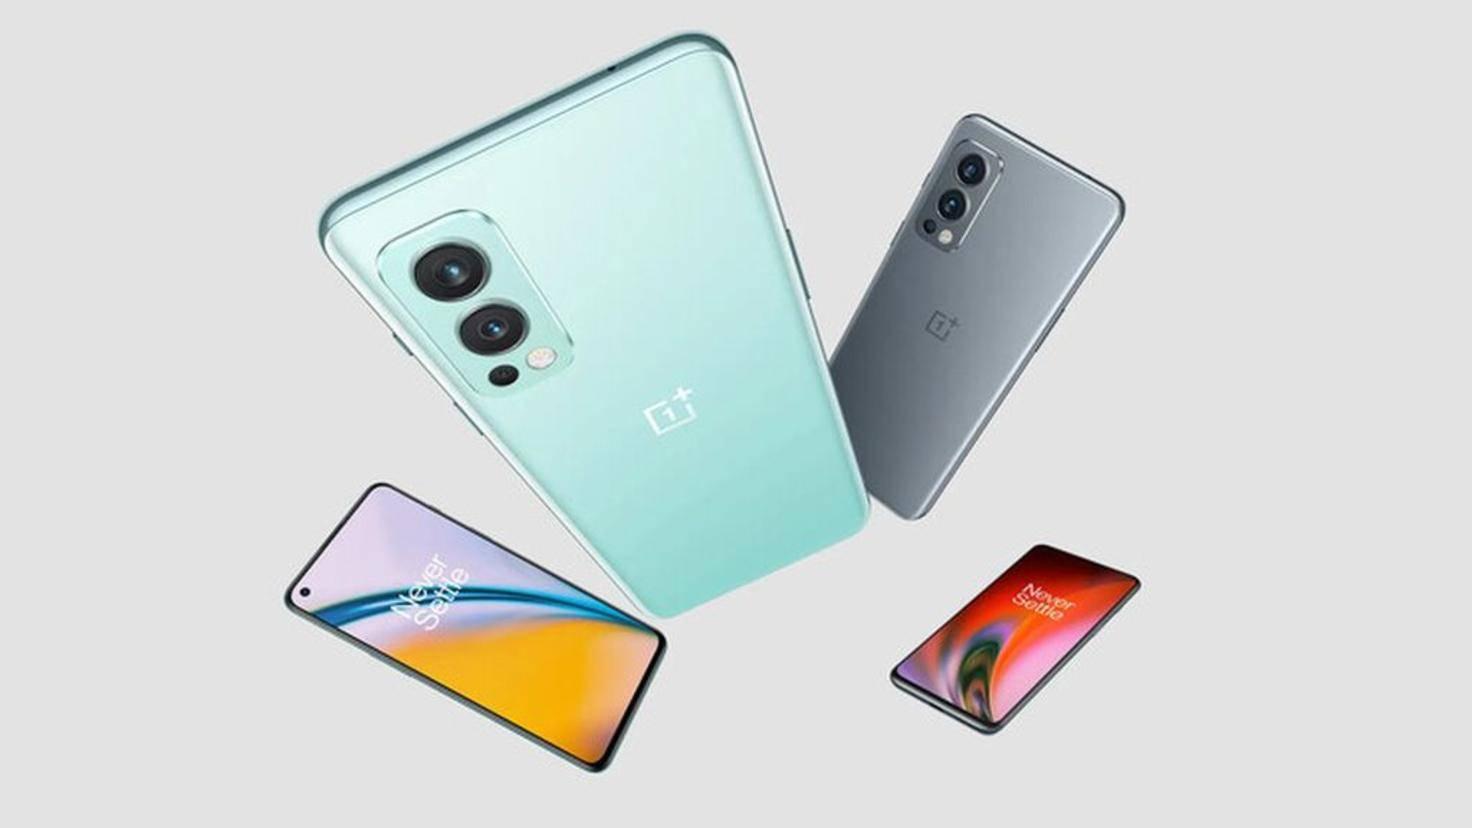 oneplus-nord-2-5g-smartphone